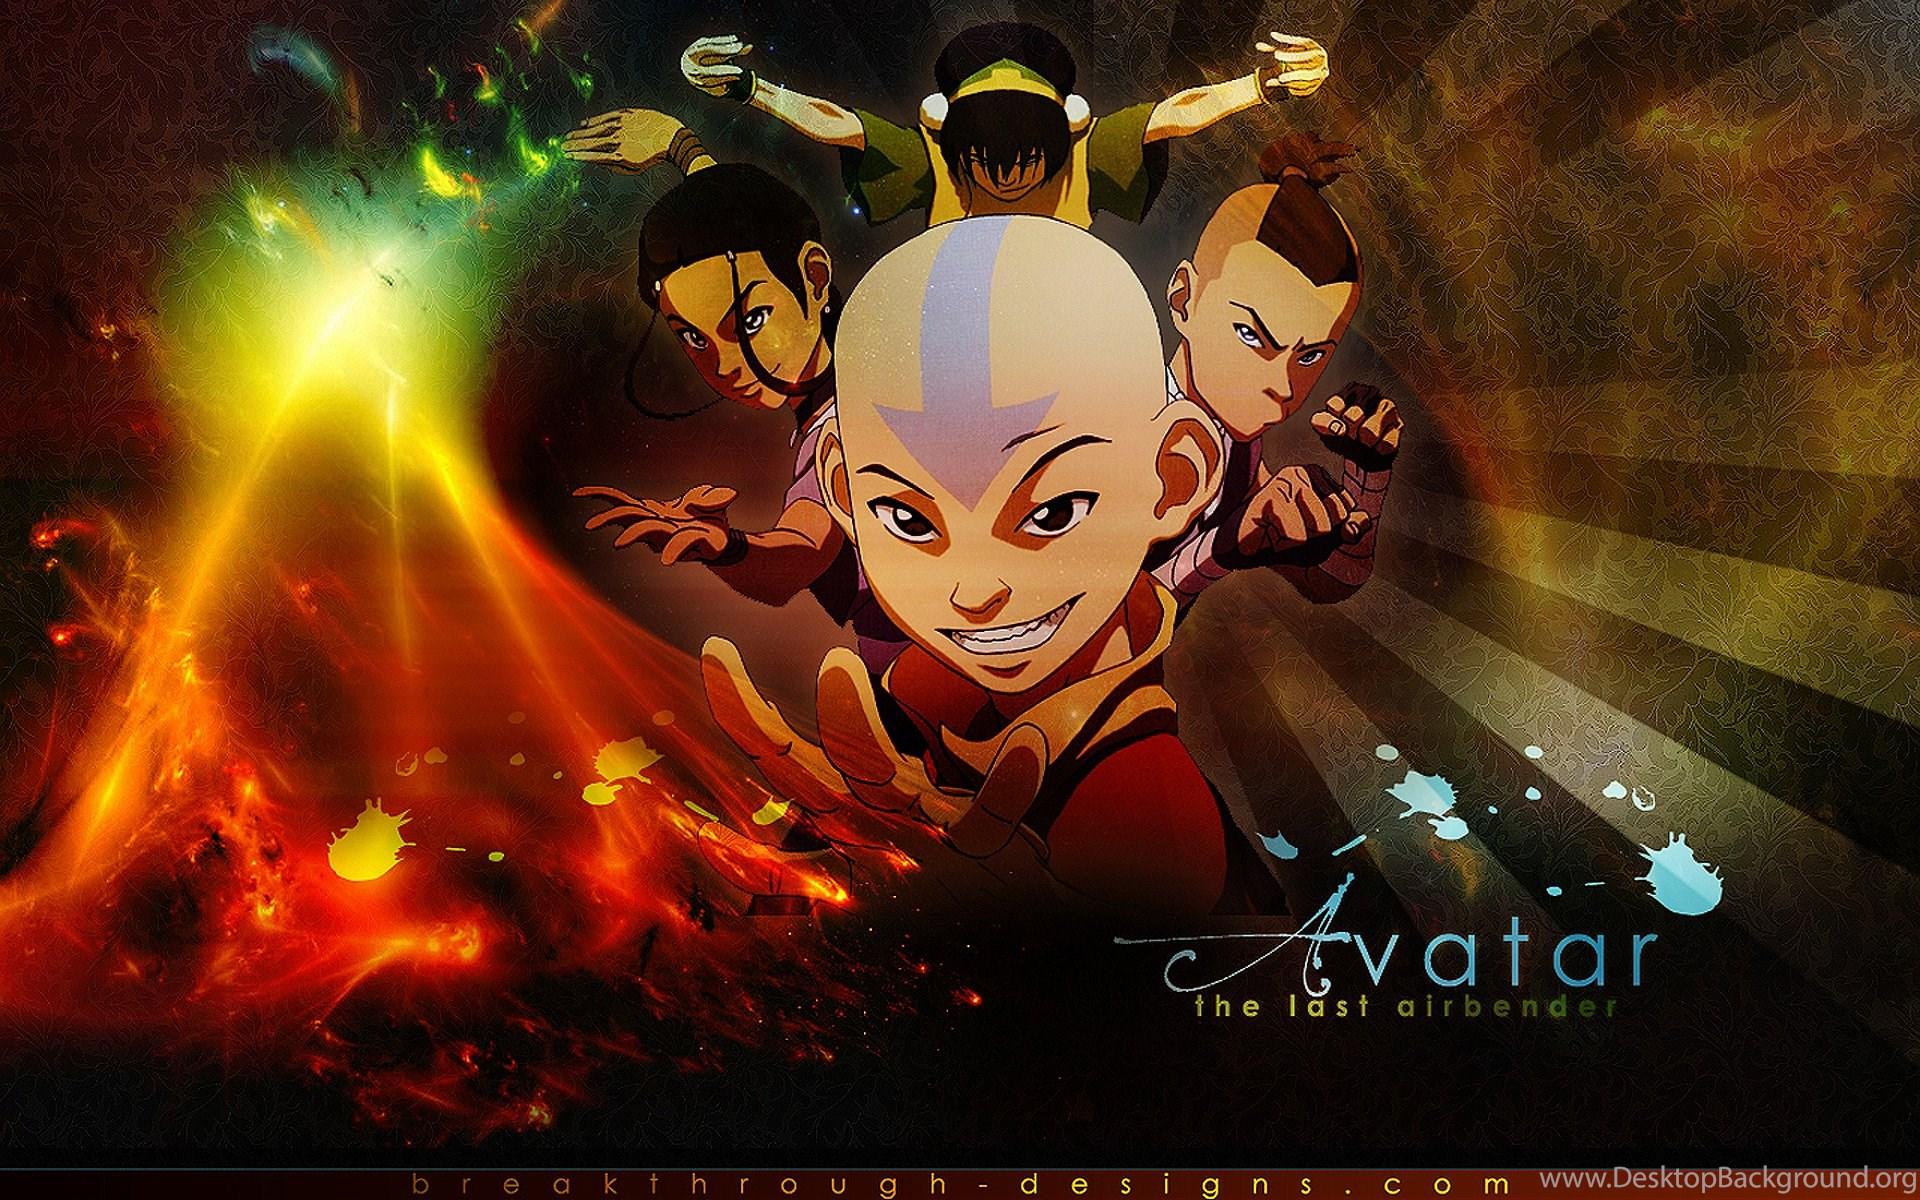 40 Avatar The Last Airbender Wallpapers For Download Desktop